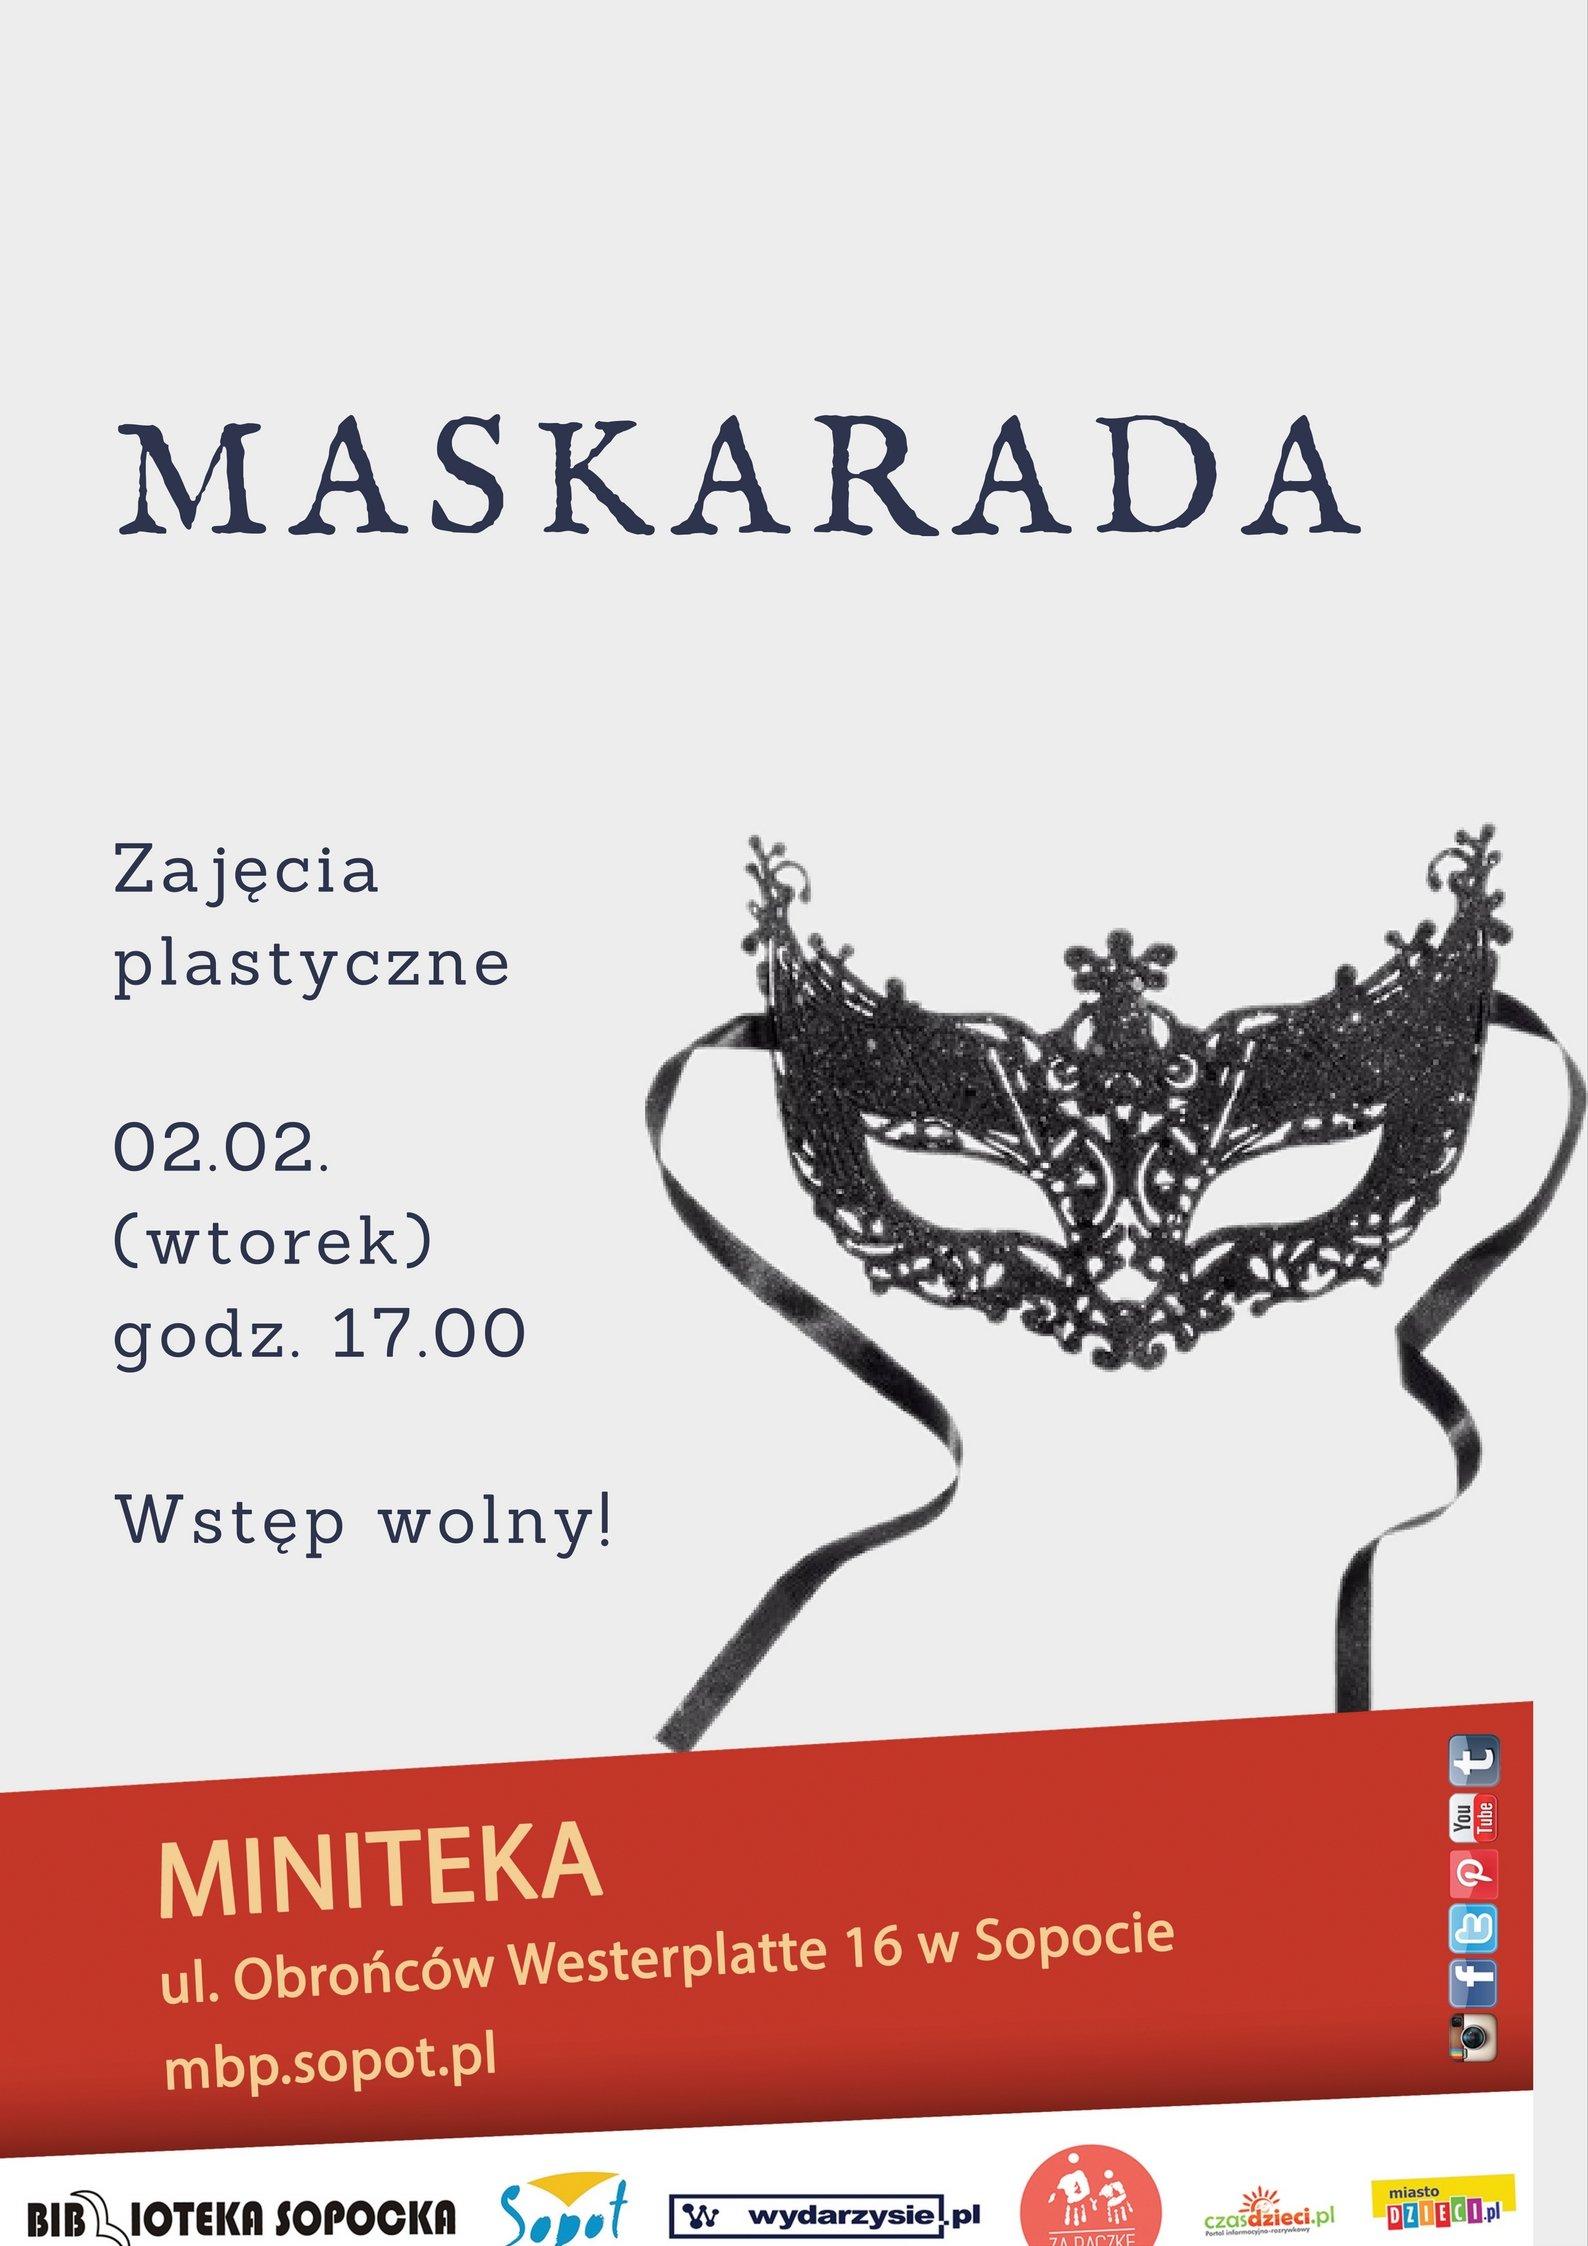 Maskarada biblioteka Sopot Miniteka